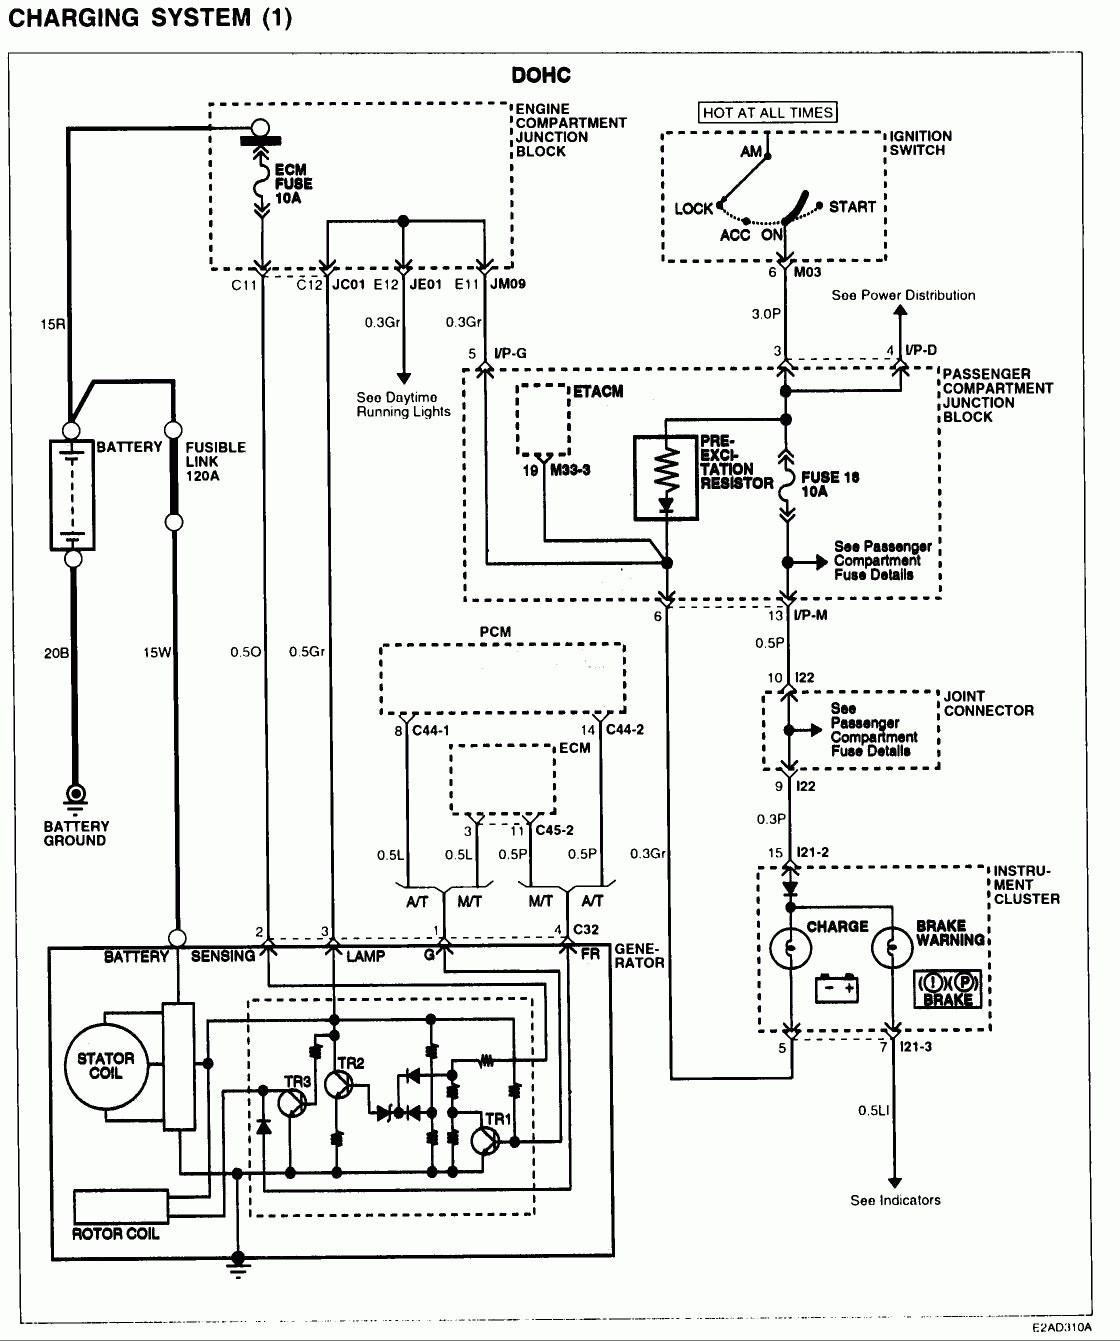 2001 Santa Fe Wiring Schematic Diagram2001 17